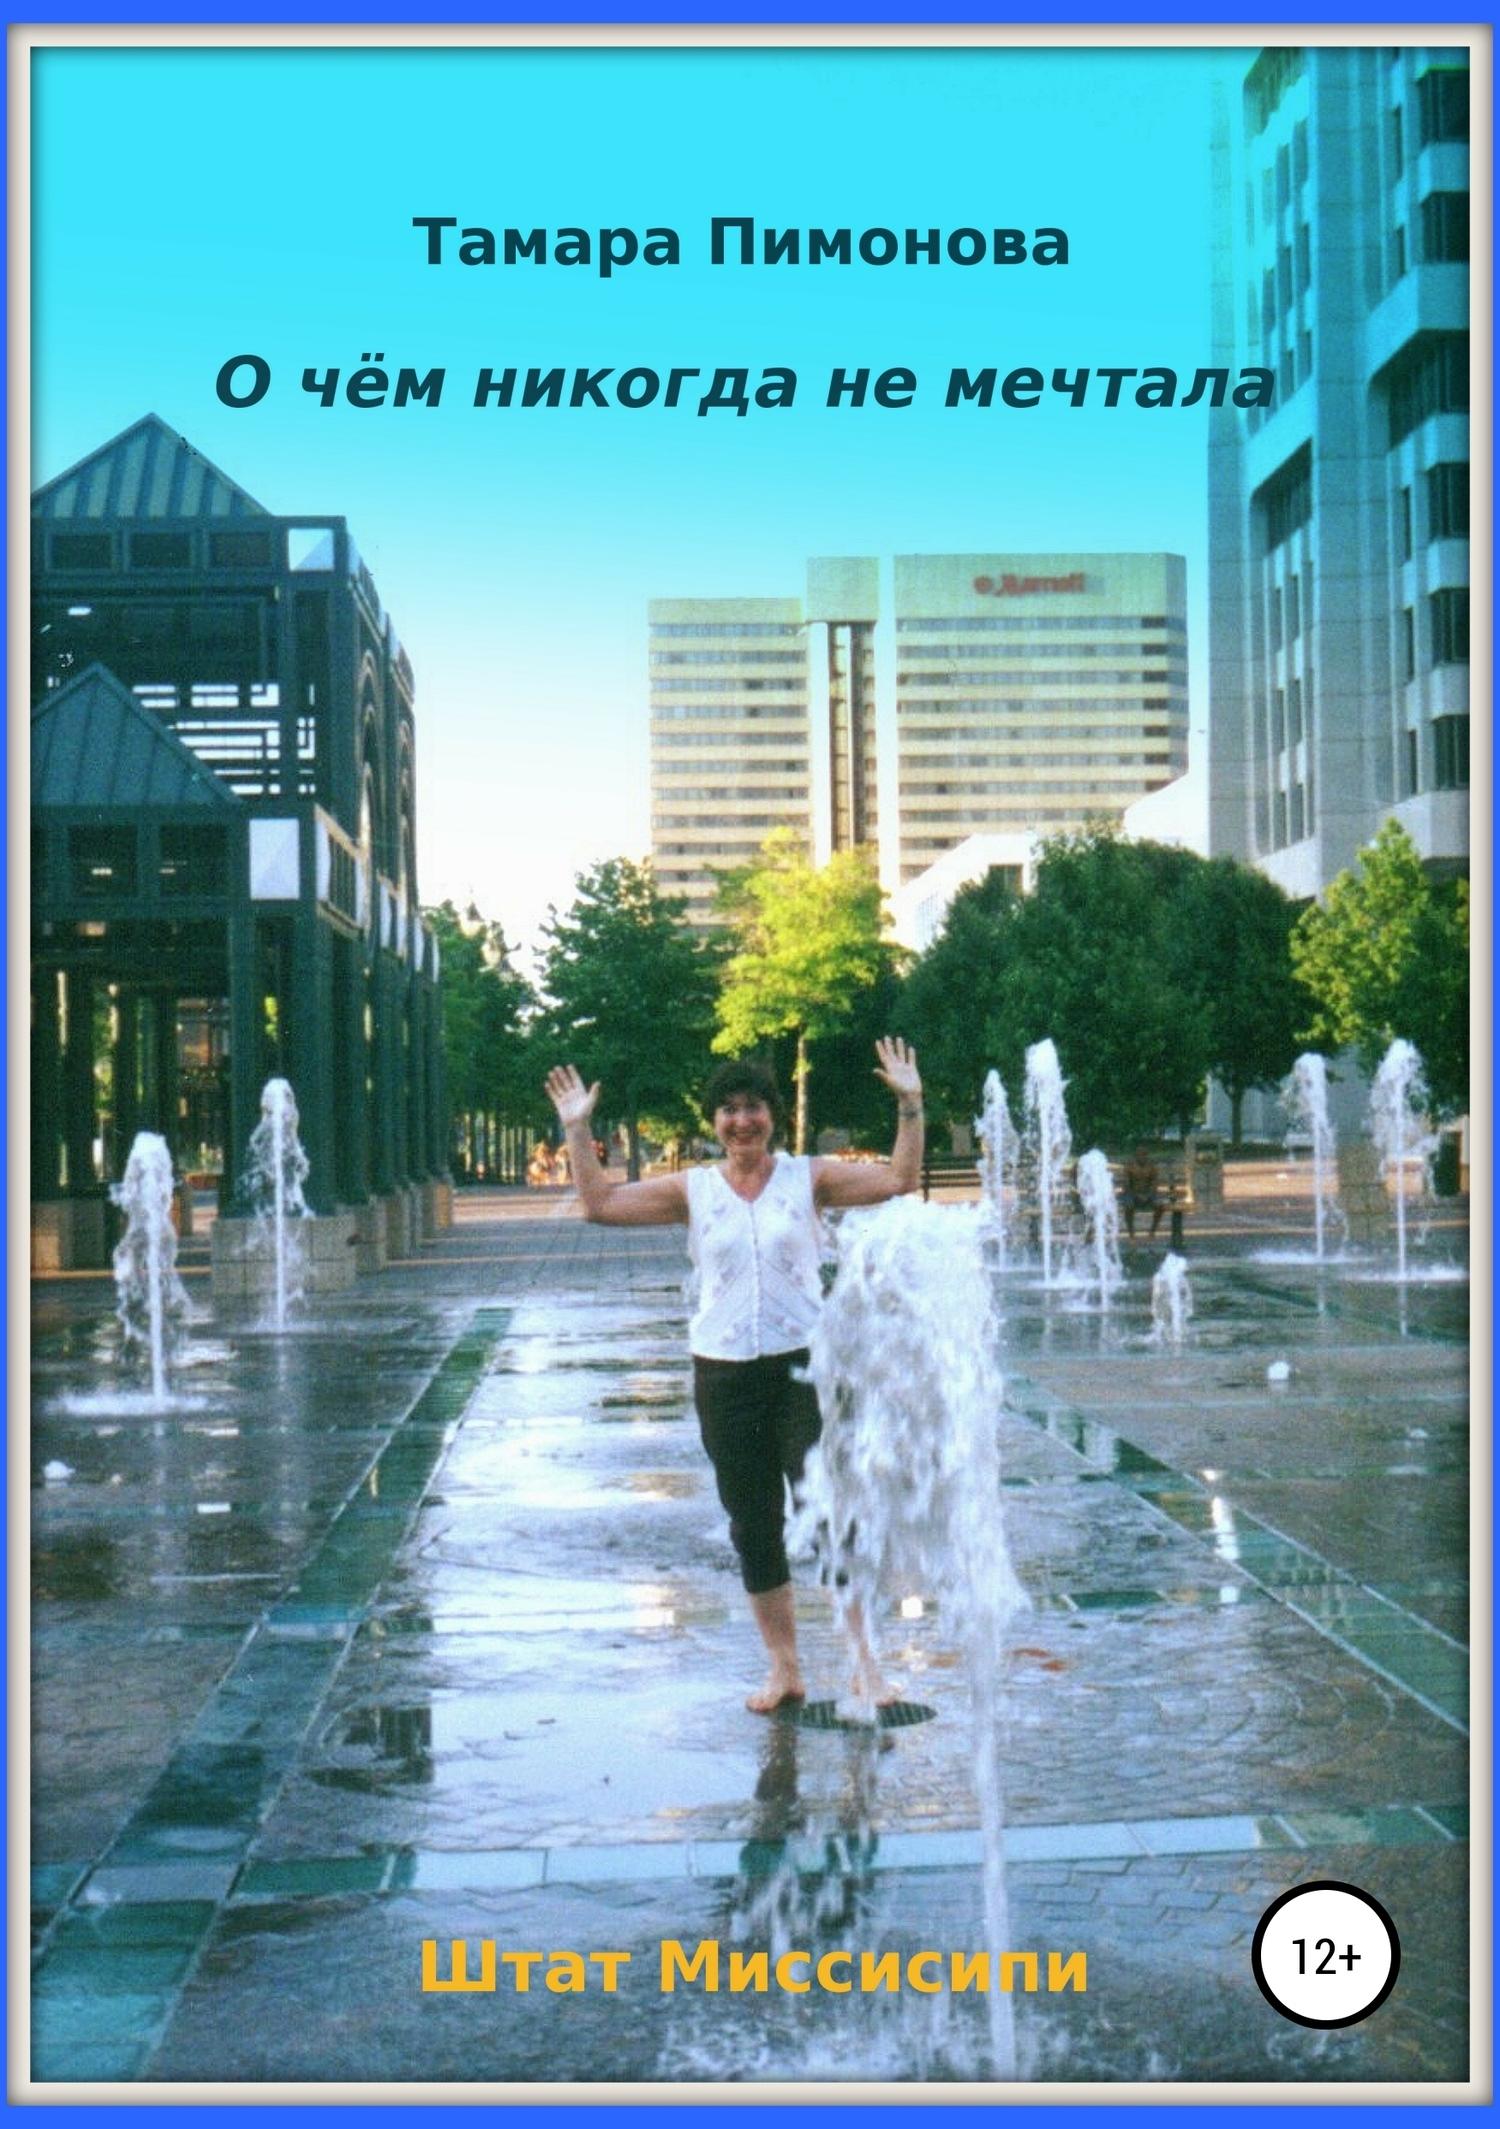 Тамара Пимонова - О чём никогда не мечтала